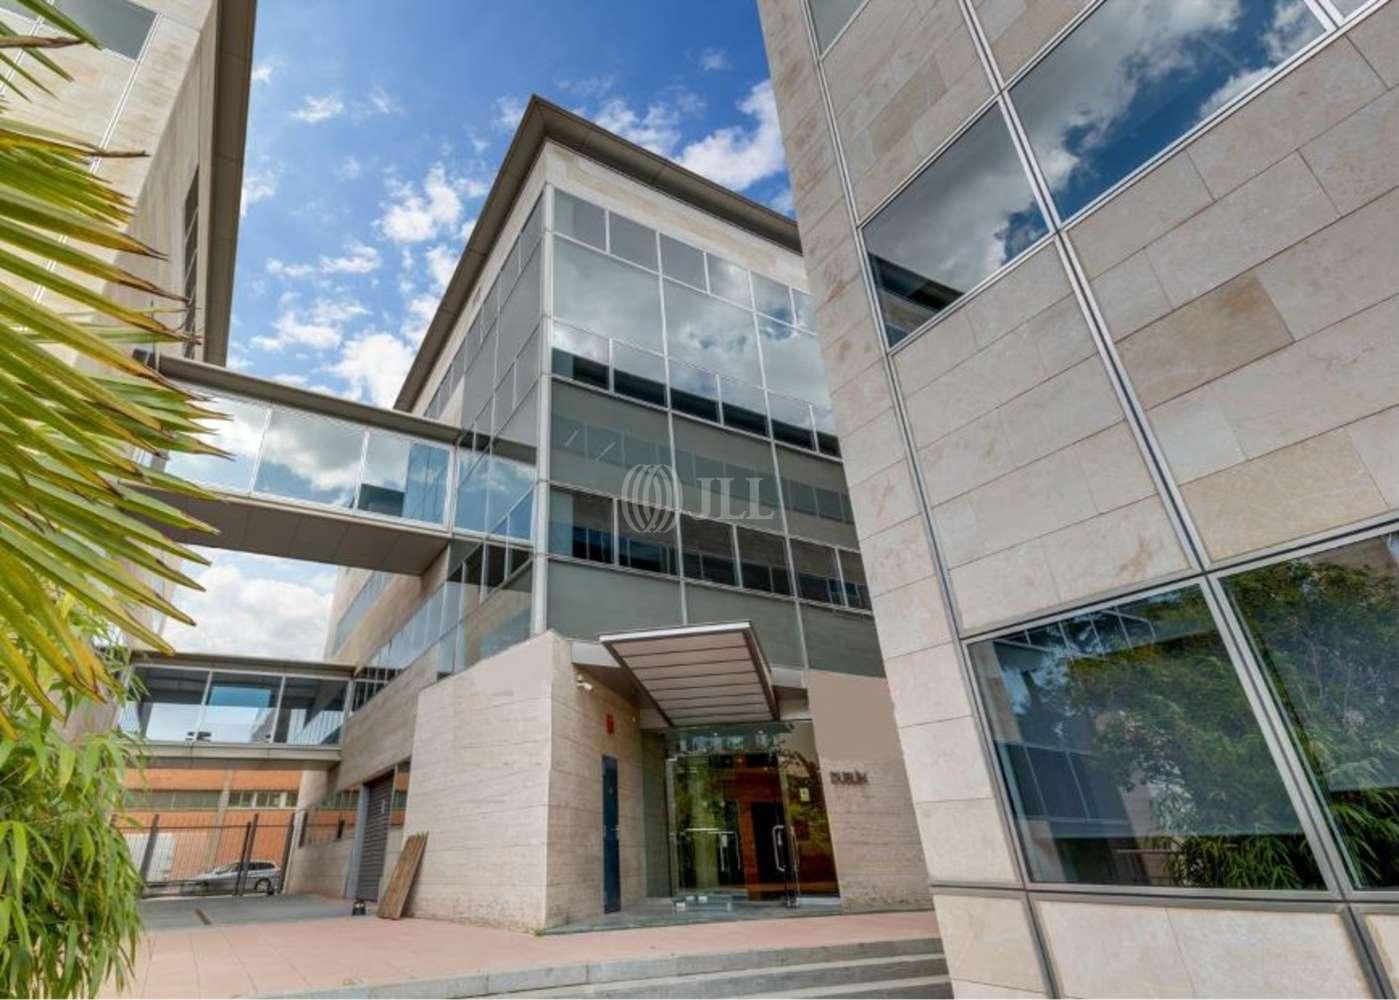 Oficina Cornellà de llobregat, 8940 - CITY PARC - EDIFICIO DUBLIN